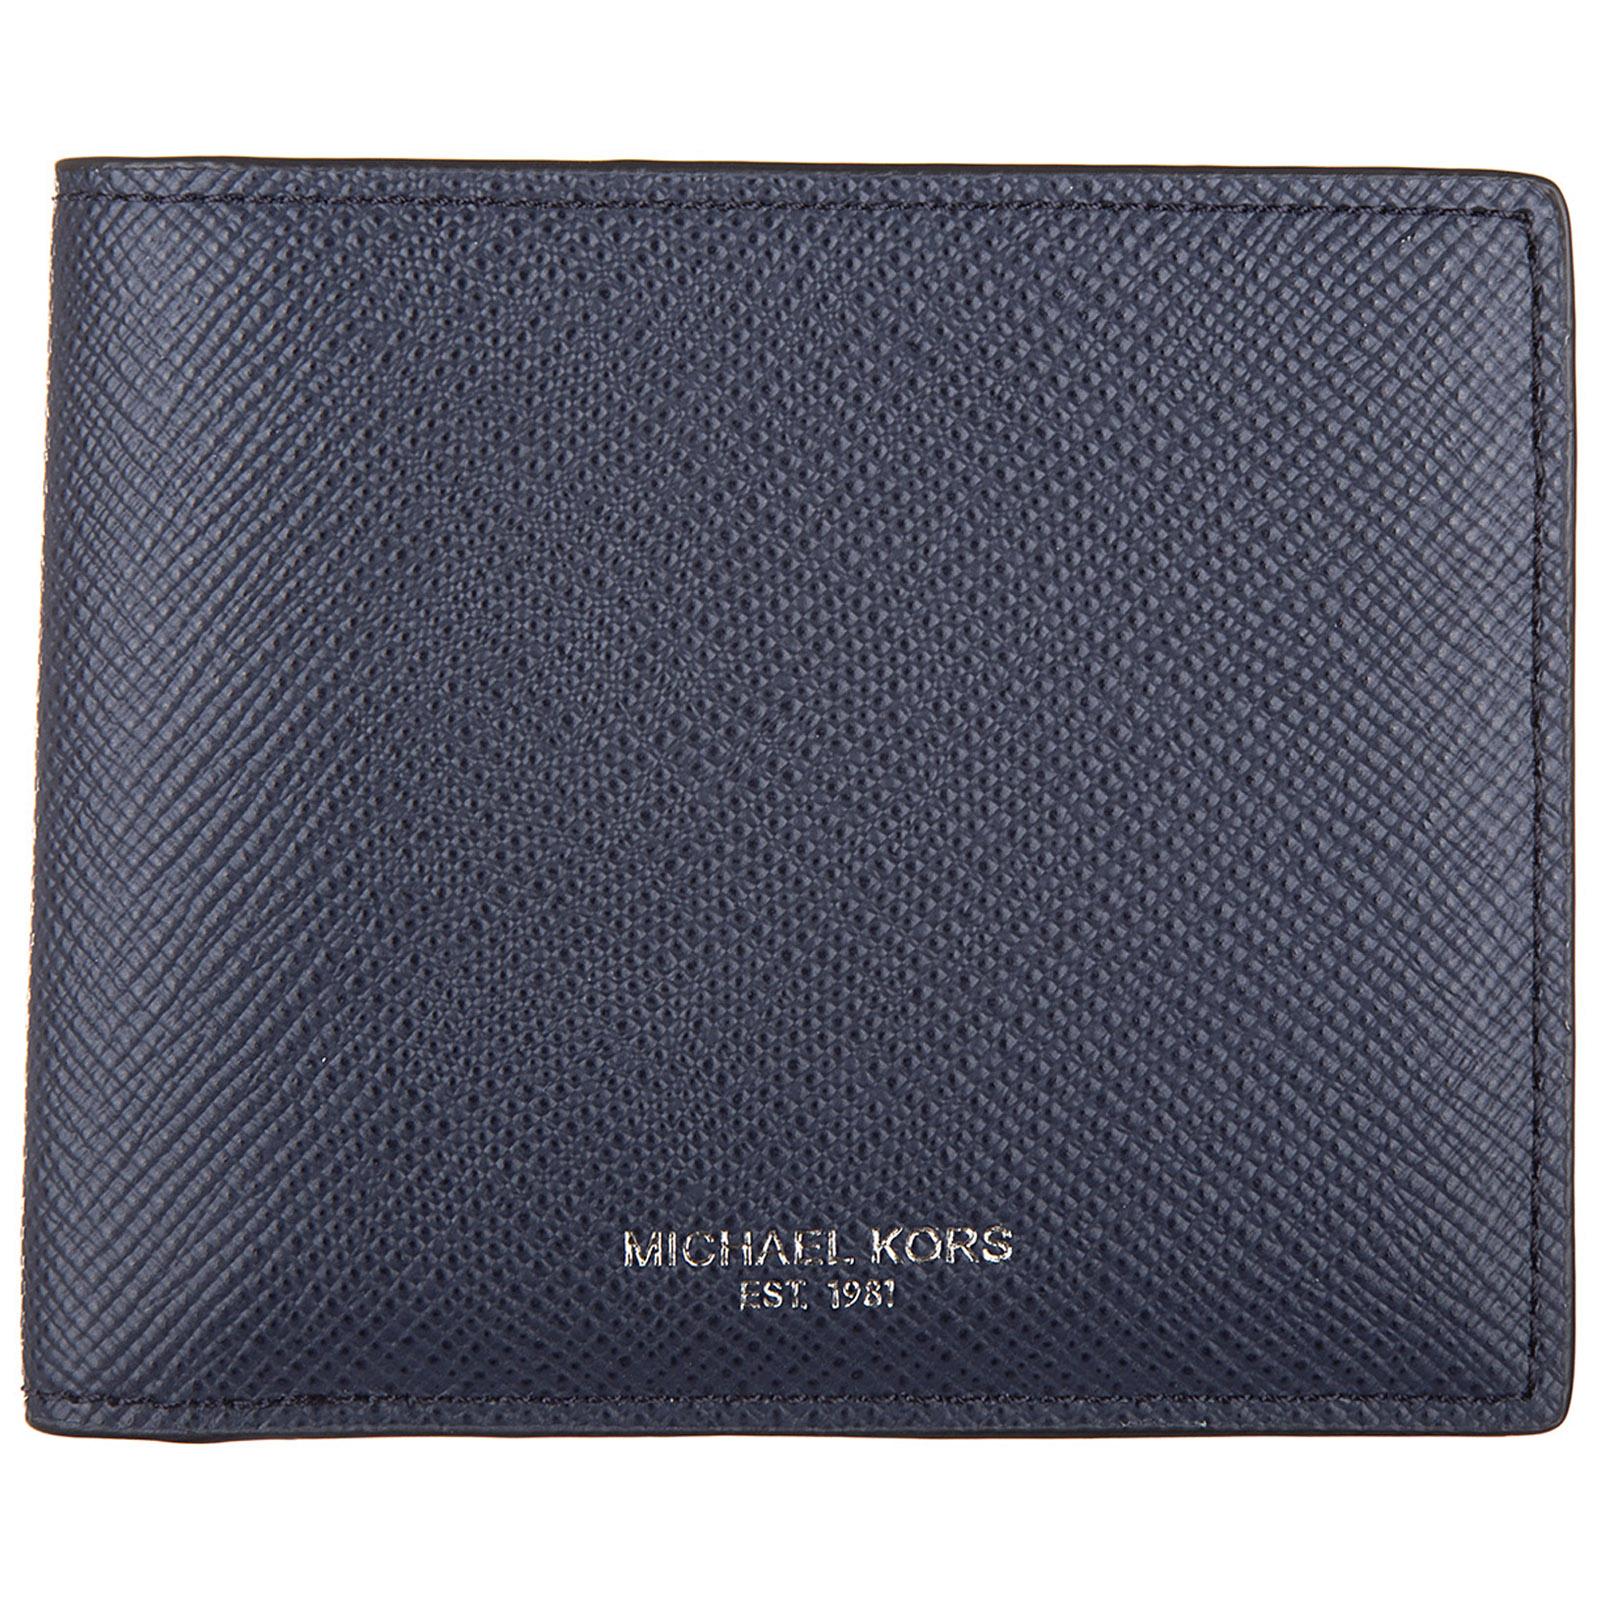 11b7ab4350a195 Men's wallet genuine leather coin case holder purse card bifold harrison ...